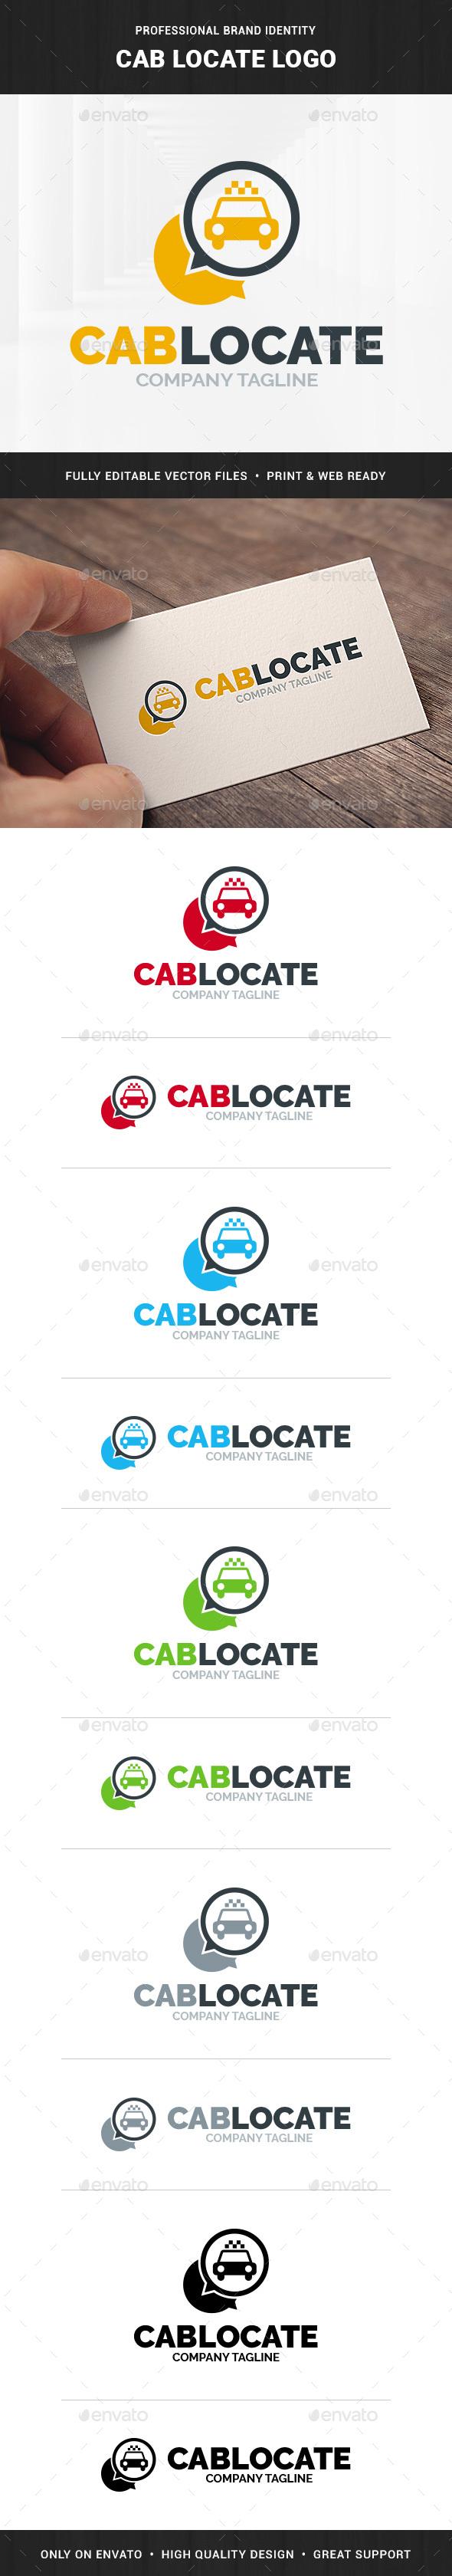 Cab Locate Logo Template